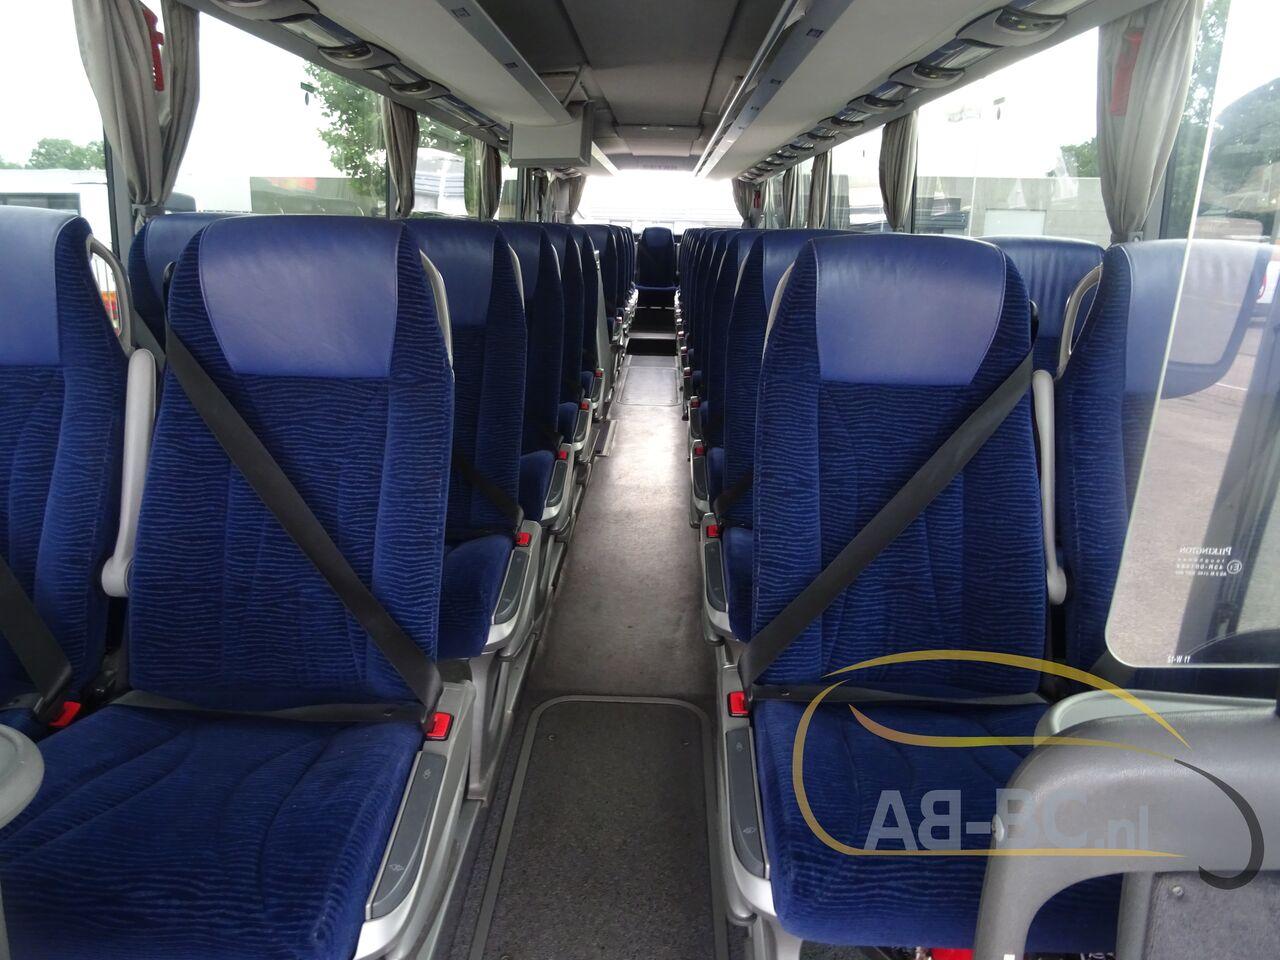 coach-busSETRA-S415-GT-HD-FINAL-EDITION---1627457176455807675_big_658f3b962df2e98f55244b75a94f4adf--21050713010665719300